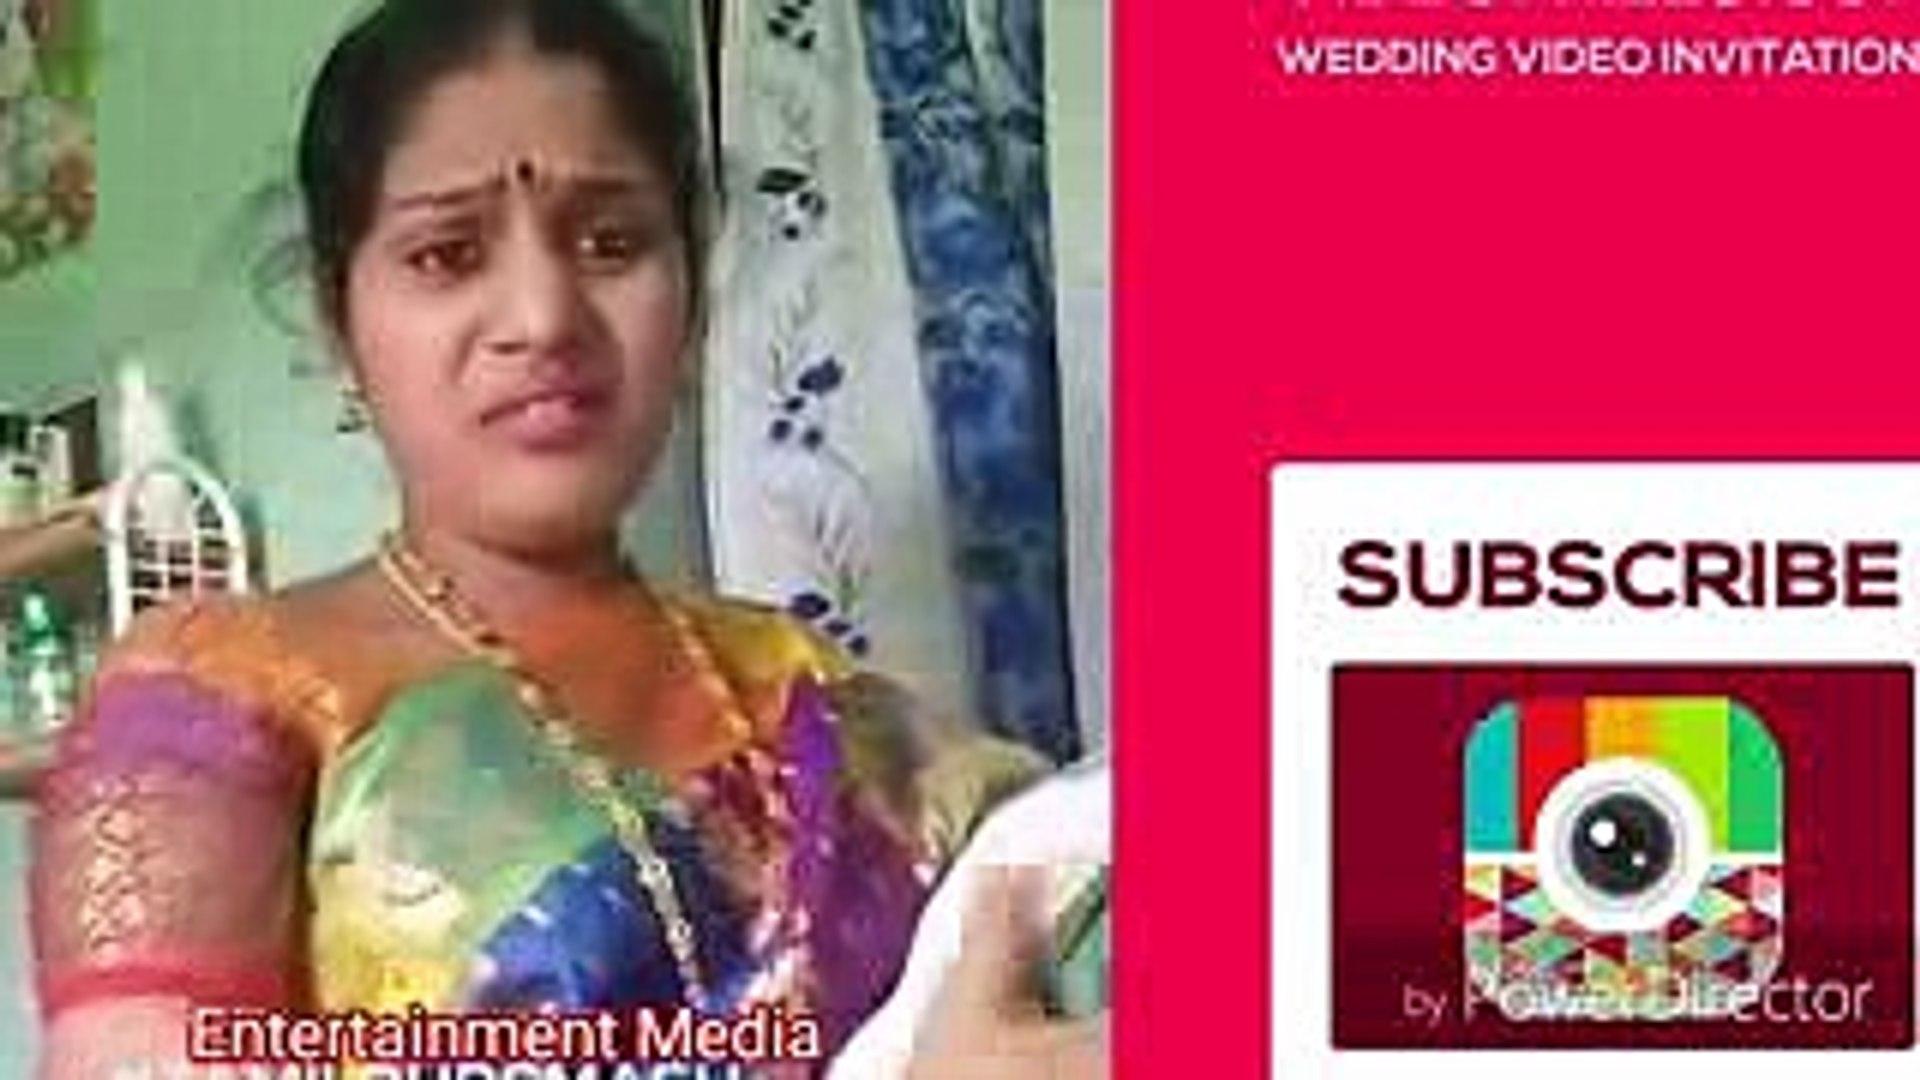 Latest VIRAL Dubsmash - Must Watch Tamil VIRAL Video - Entertainment Media